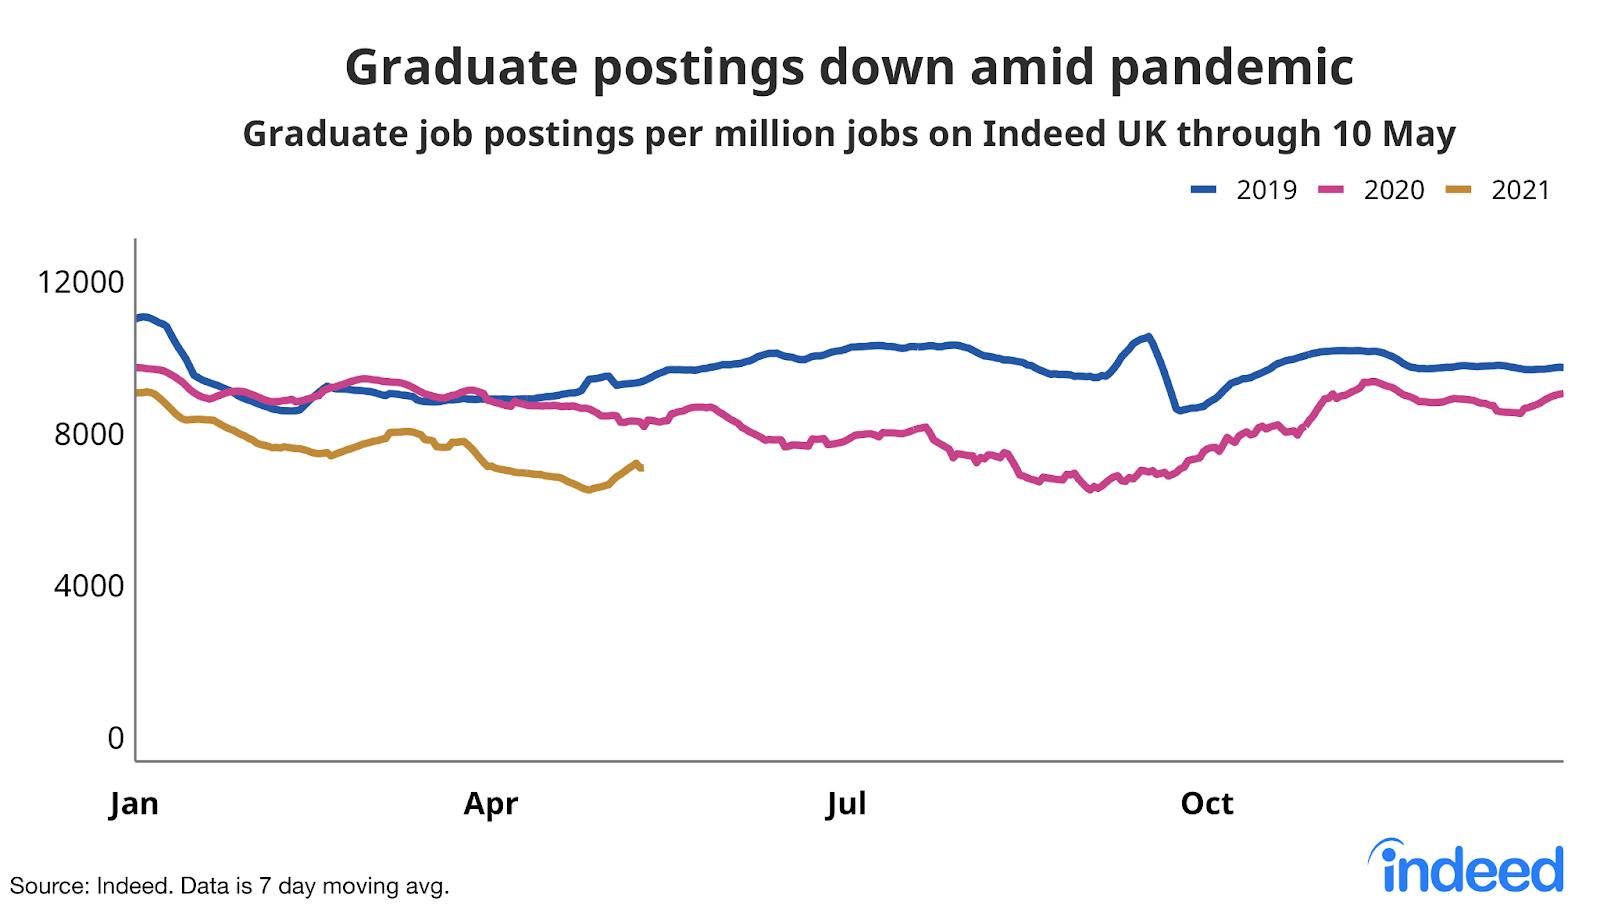 Line graph showing graduate job postings down amid pandemic